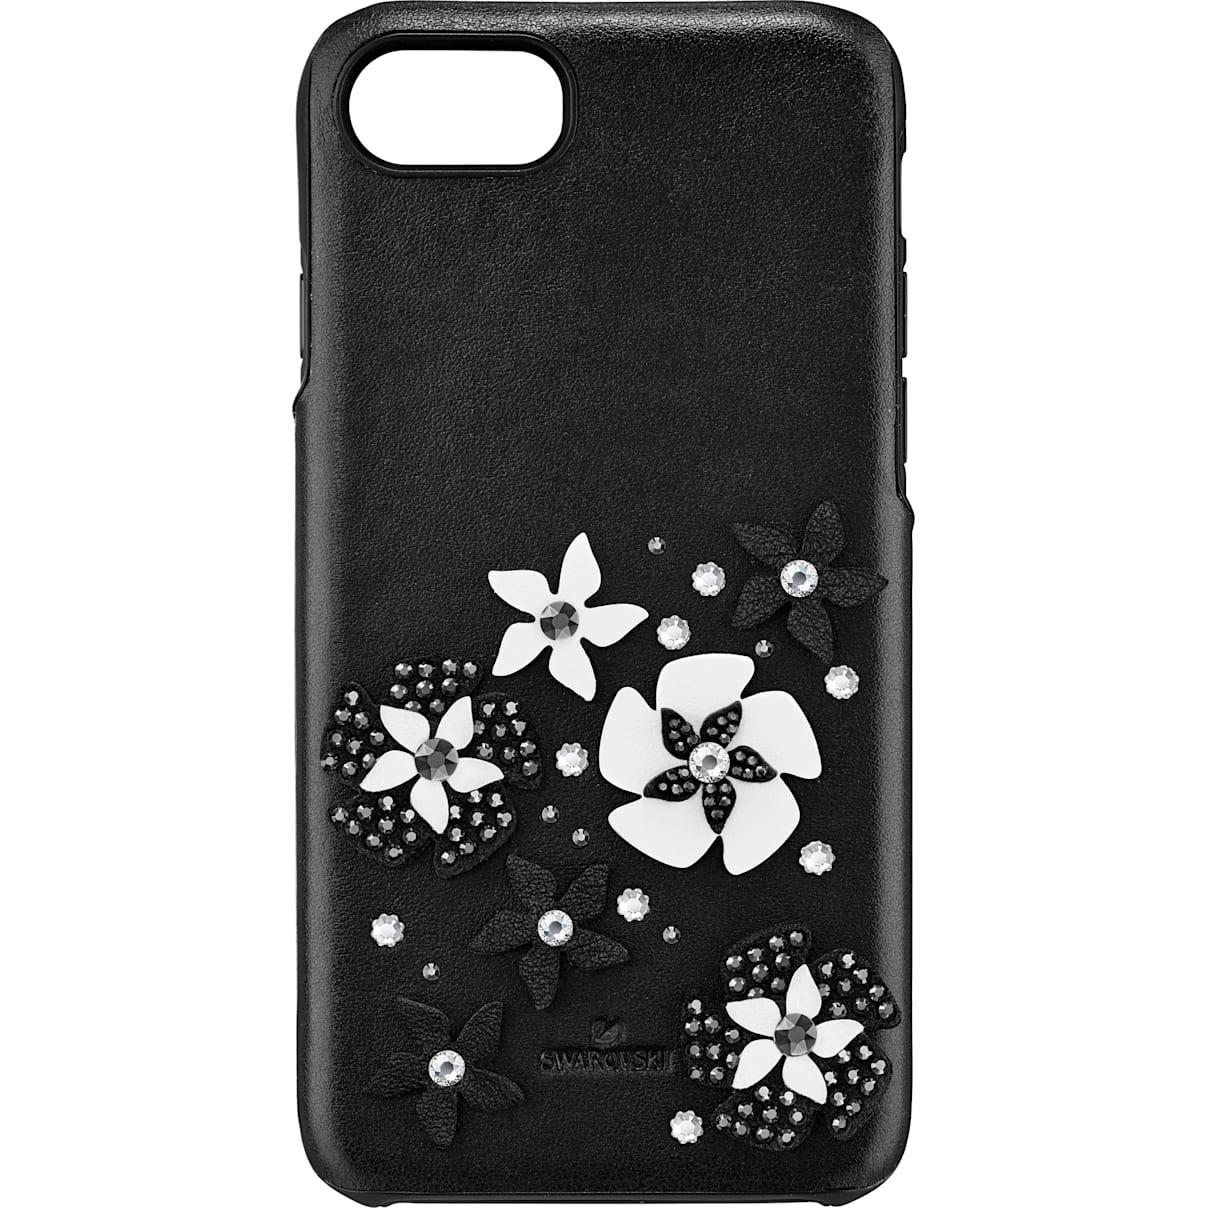 Swarovski Mazy Smartphone Case with integrated Bumper, iPhone® 8, Black